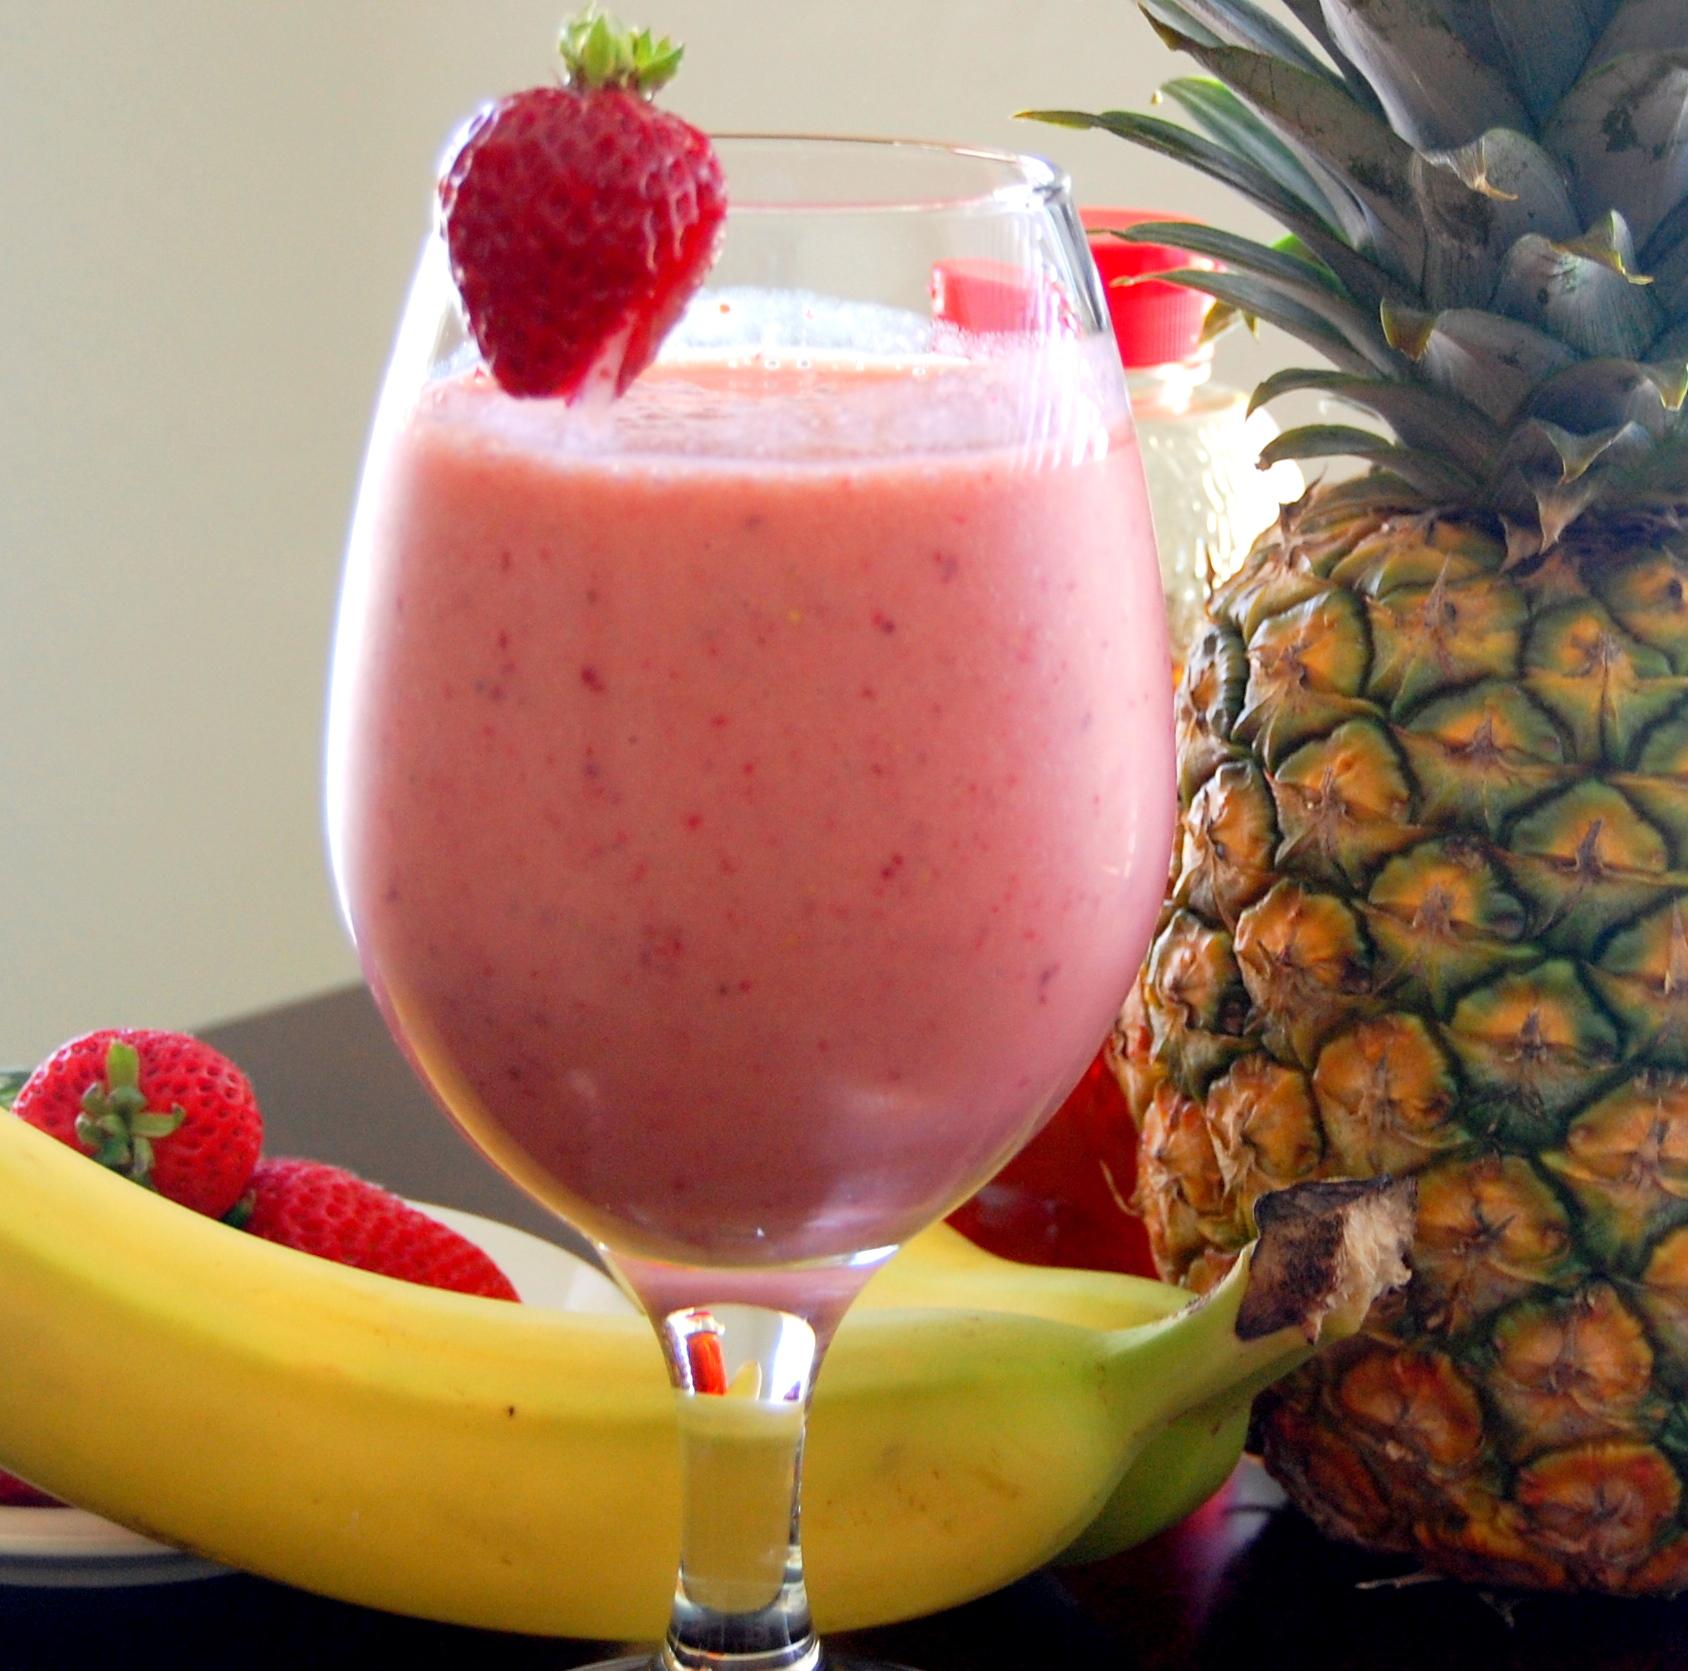 strawberry-banana-pineapple-smoothie